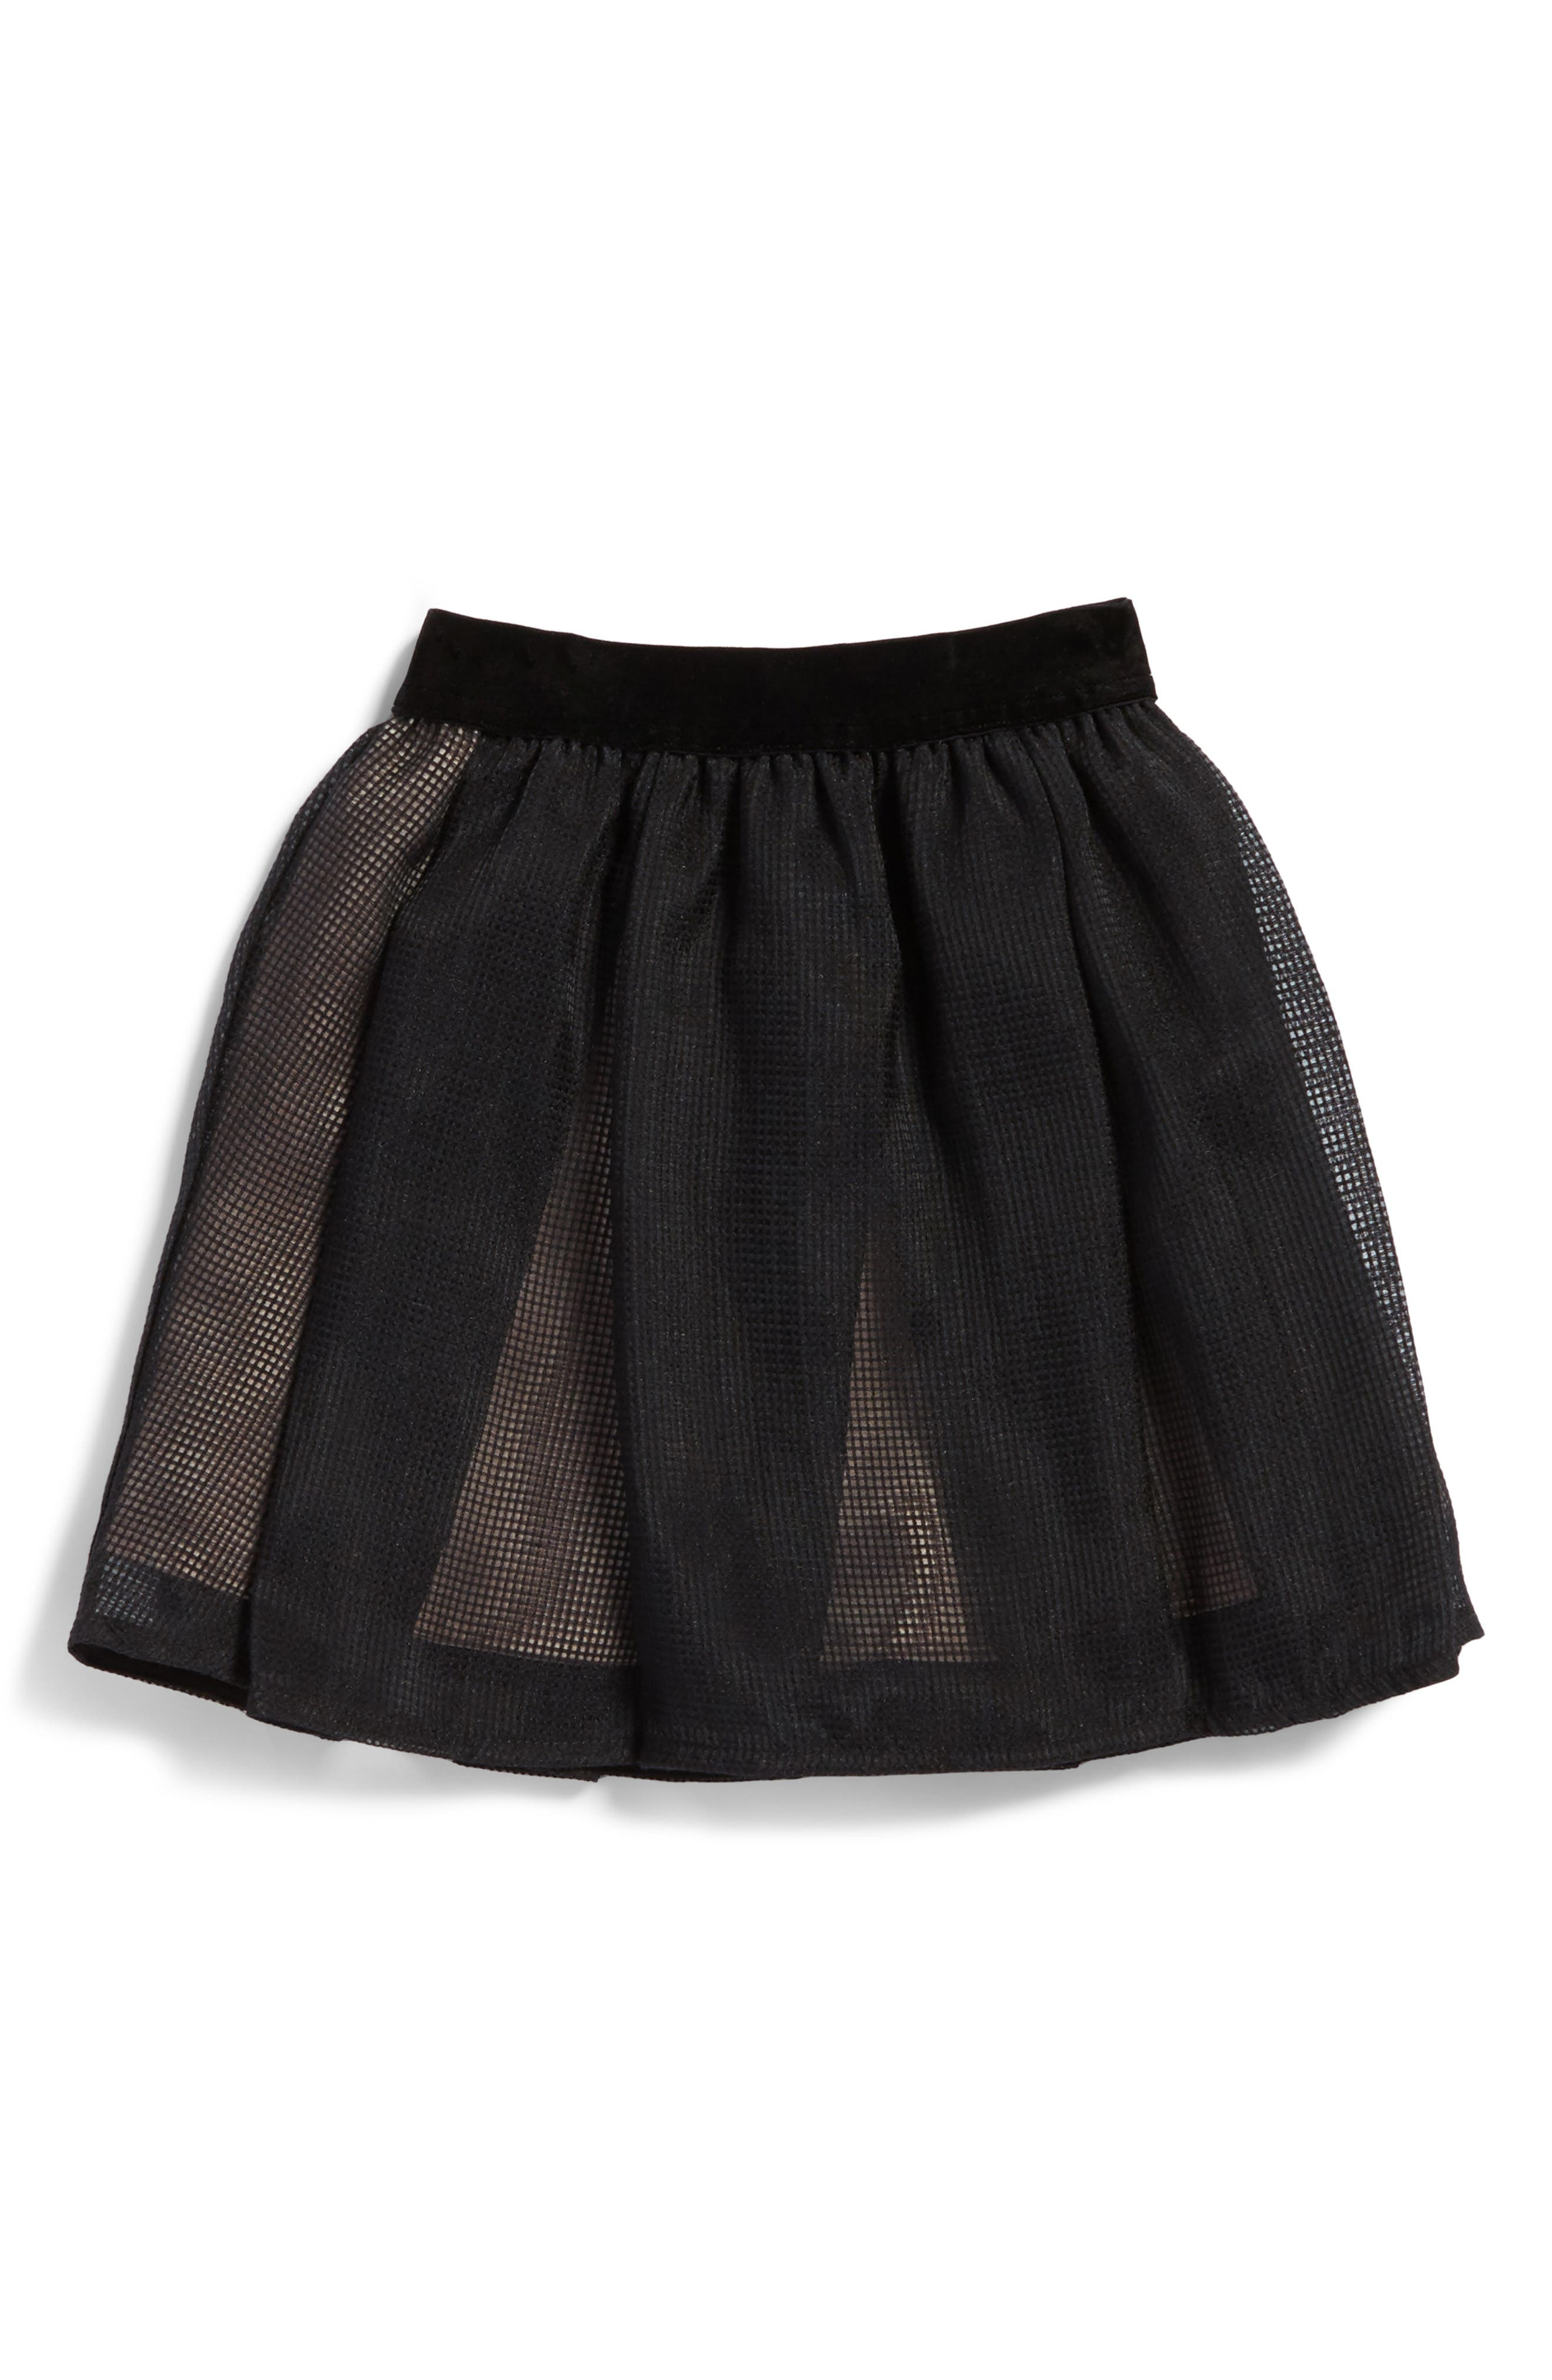 Blaire Mesh Skirt,                         Main,                         color, Black